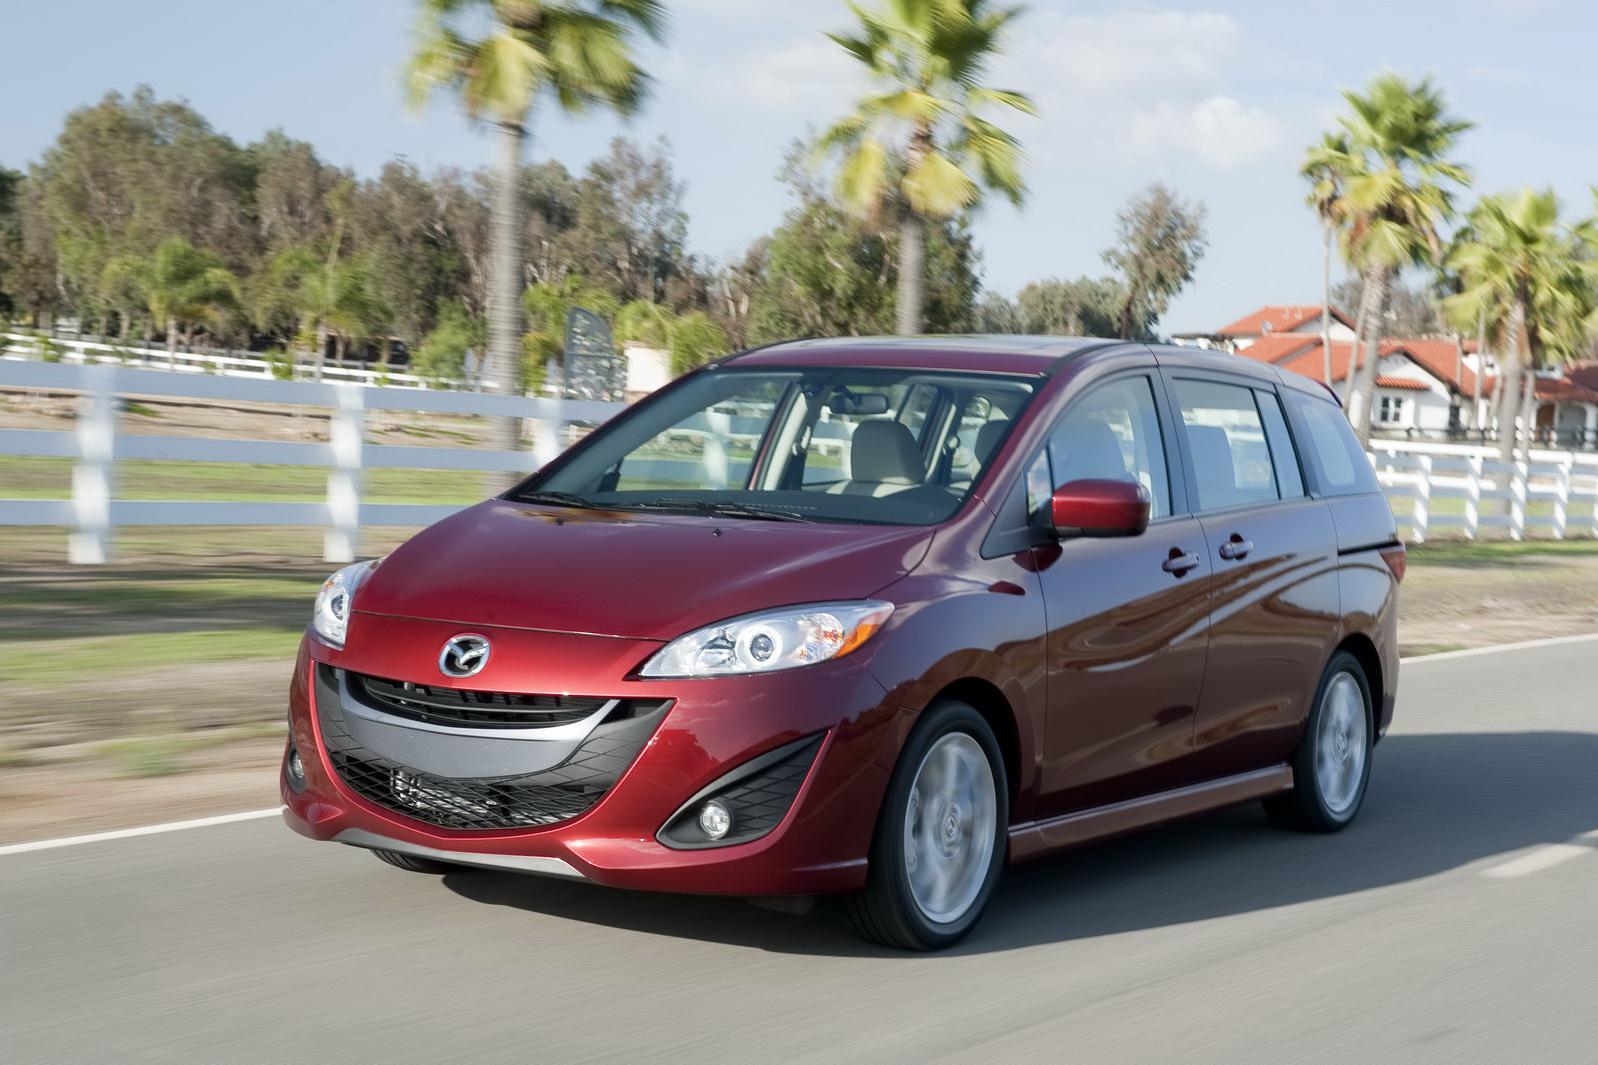 2012 mazda5 minivan starts at under 20 000 autoevolution. Black Bedroom Furniture Sets. Home Design Ideas